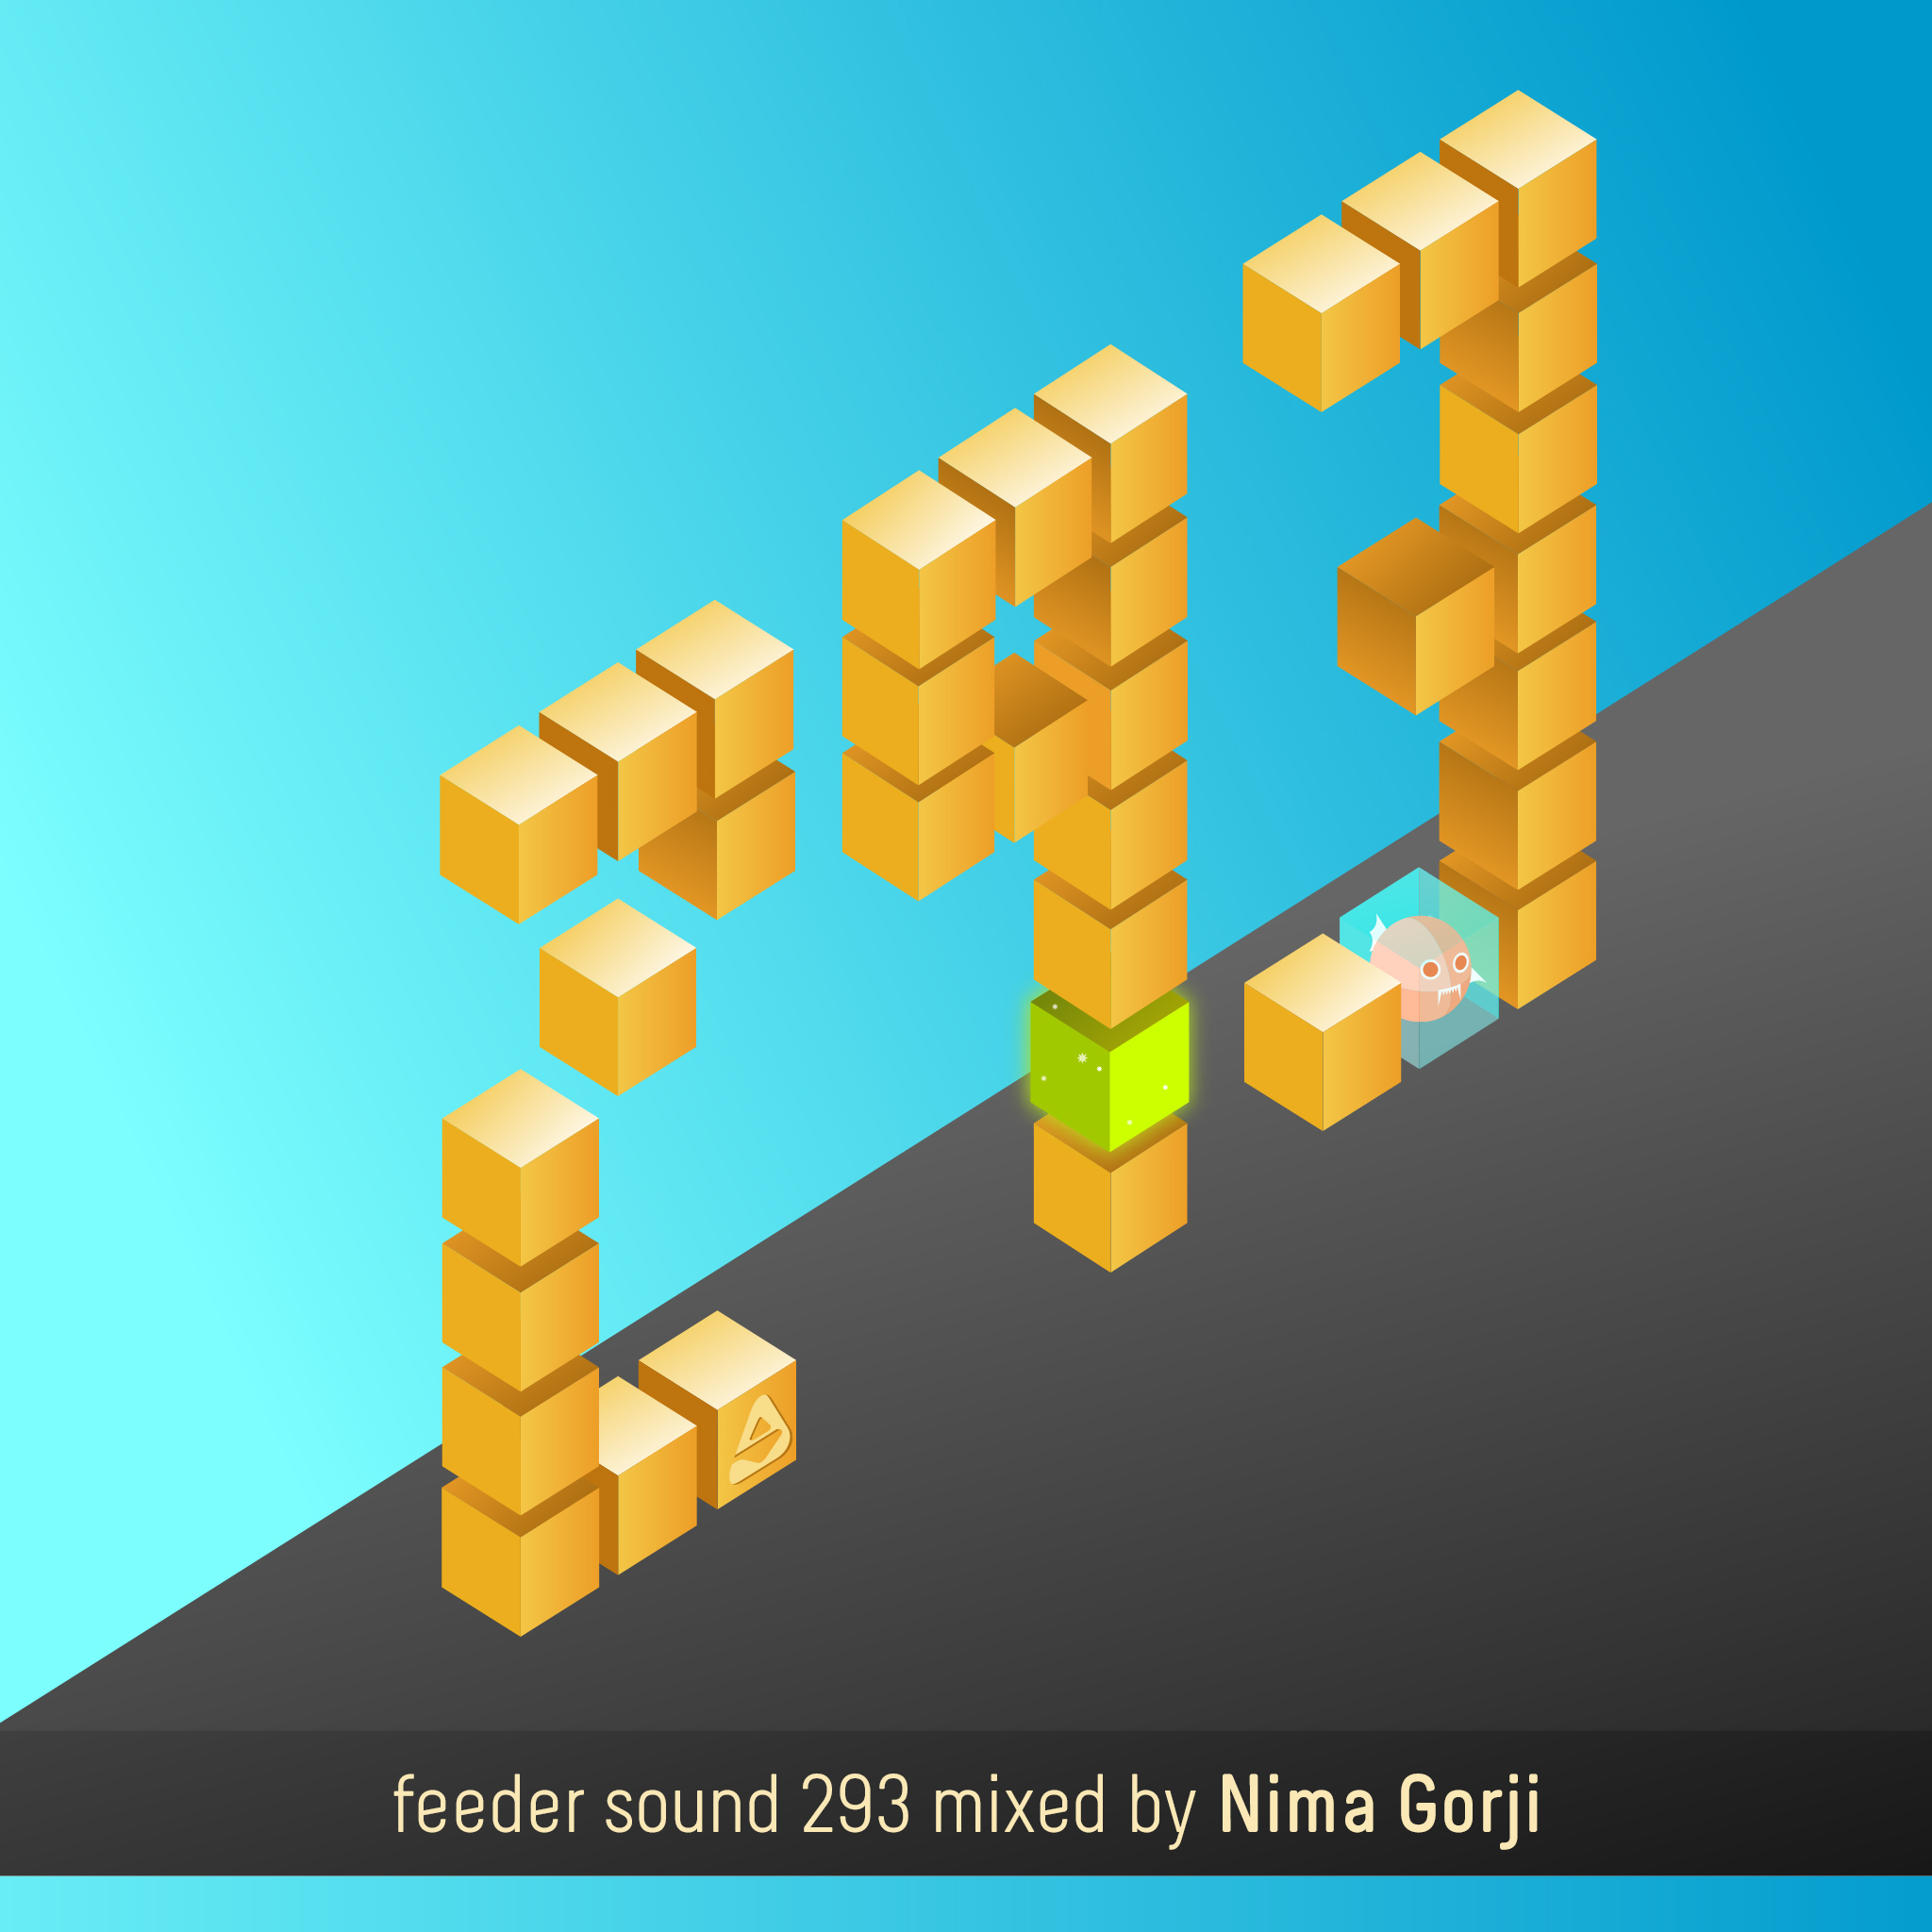 feeder sound 293 mixed by Nima Gorji 01